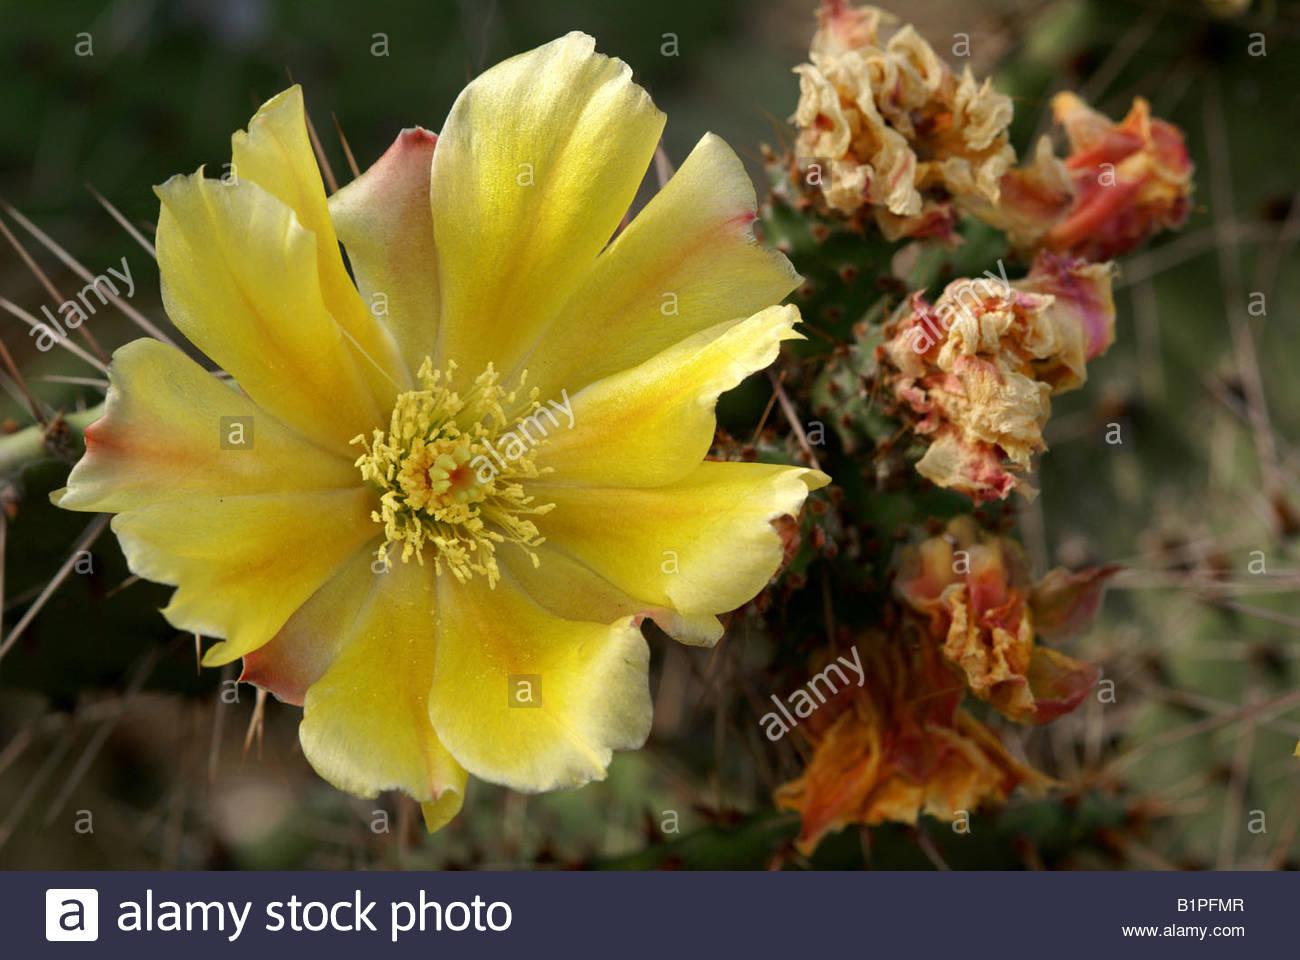 Opuntia ficus indica | flower of Indian Fig Opuntia cactus | fleur de Figuier de Barbarie Stock Photo